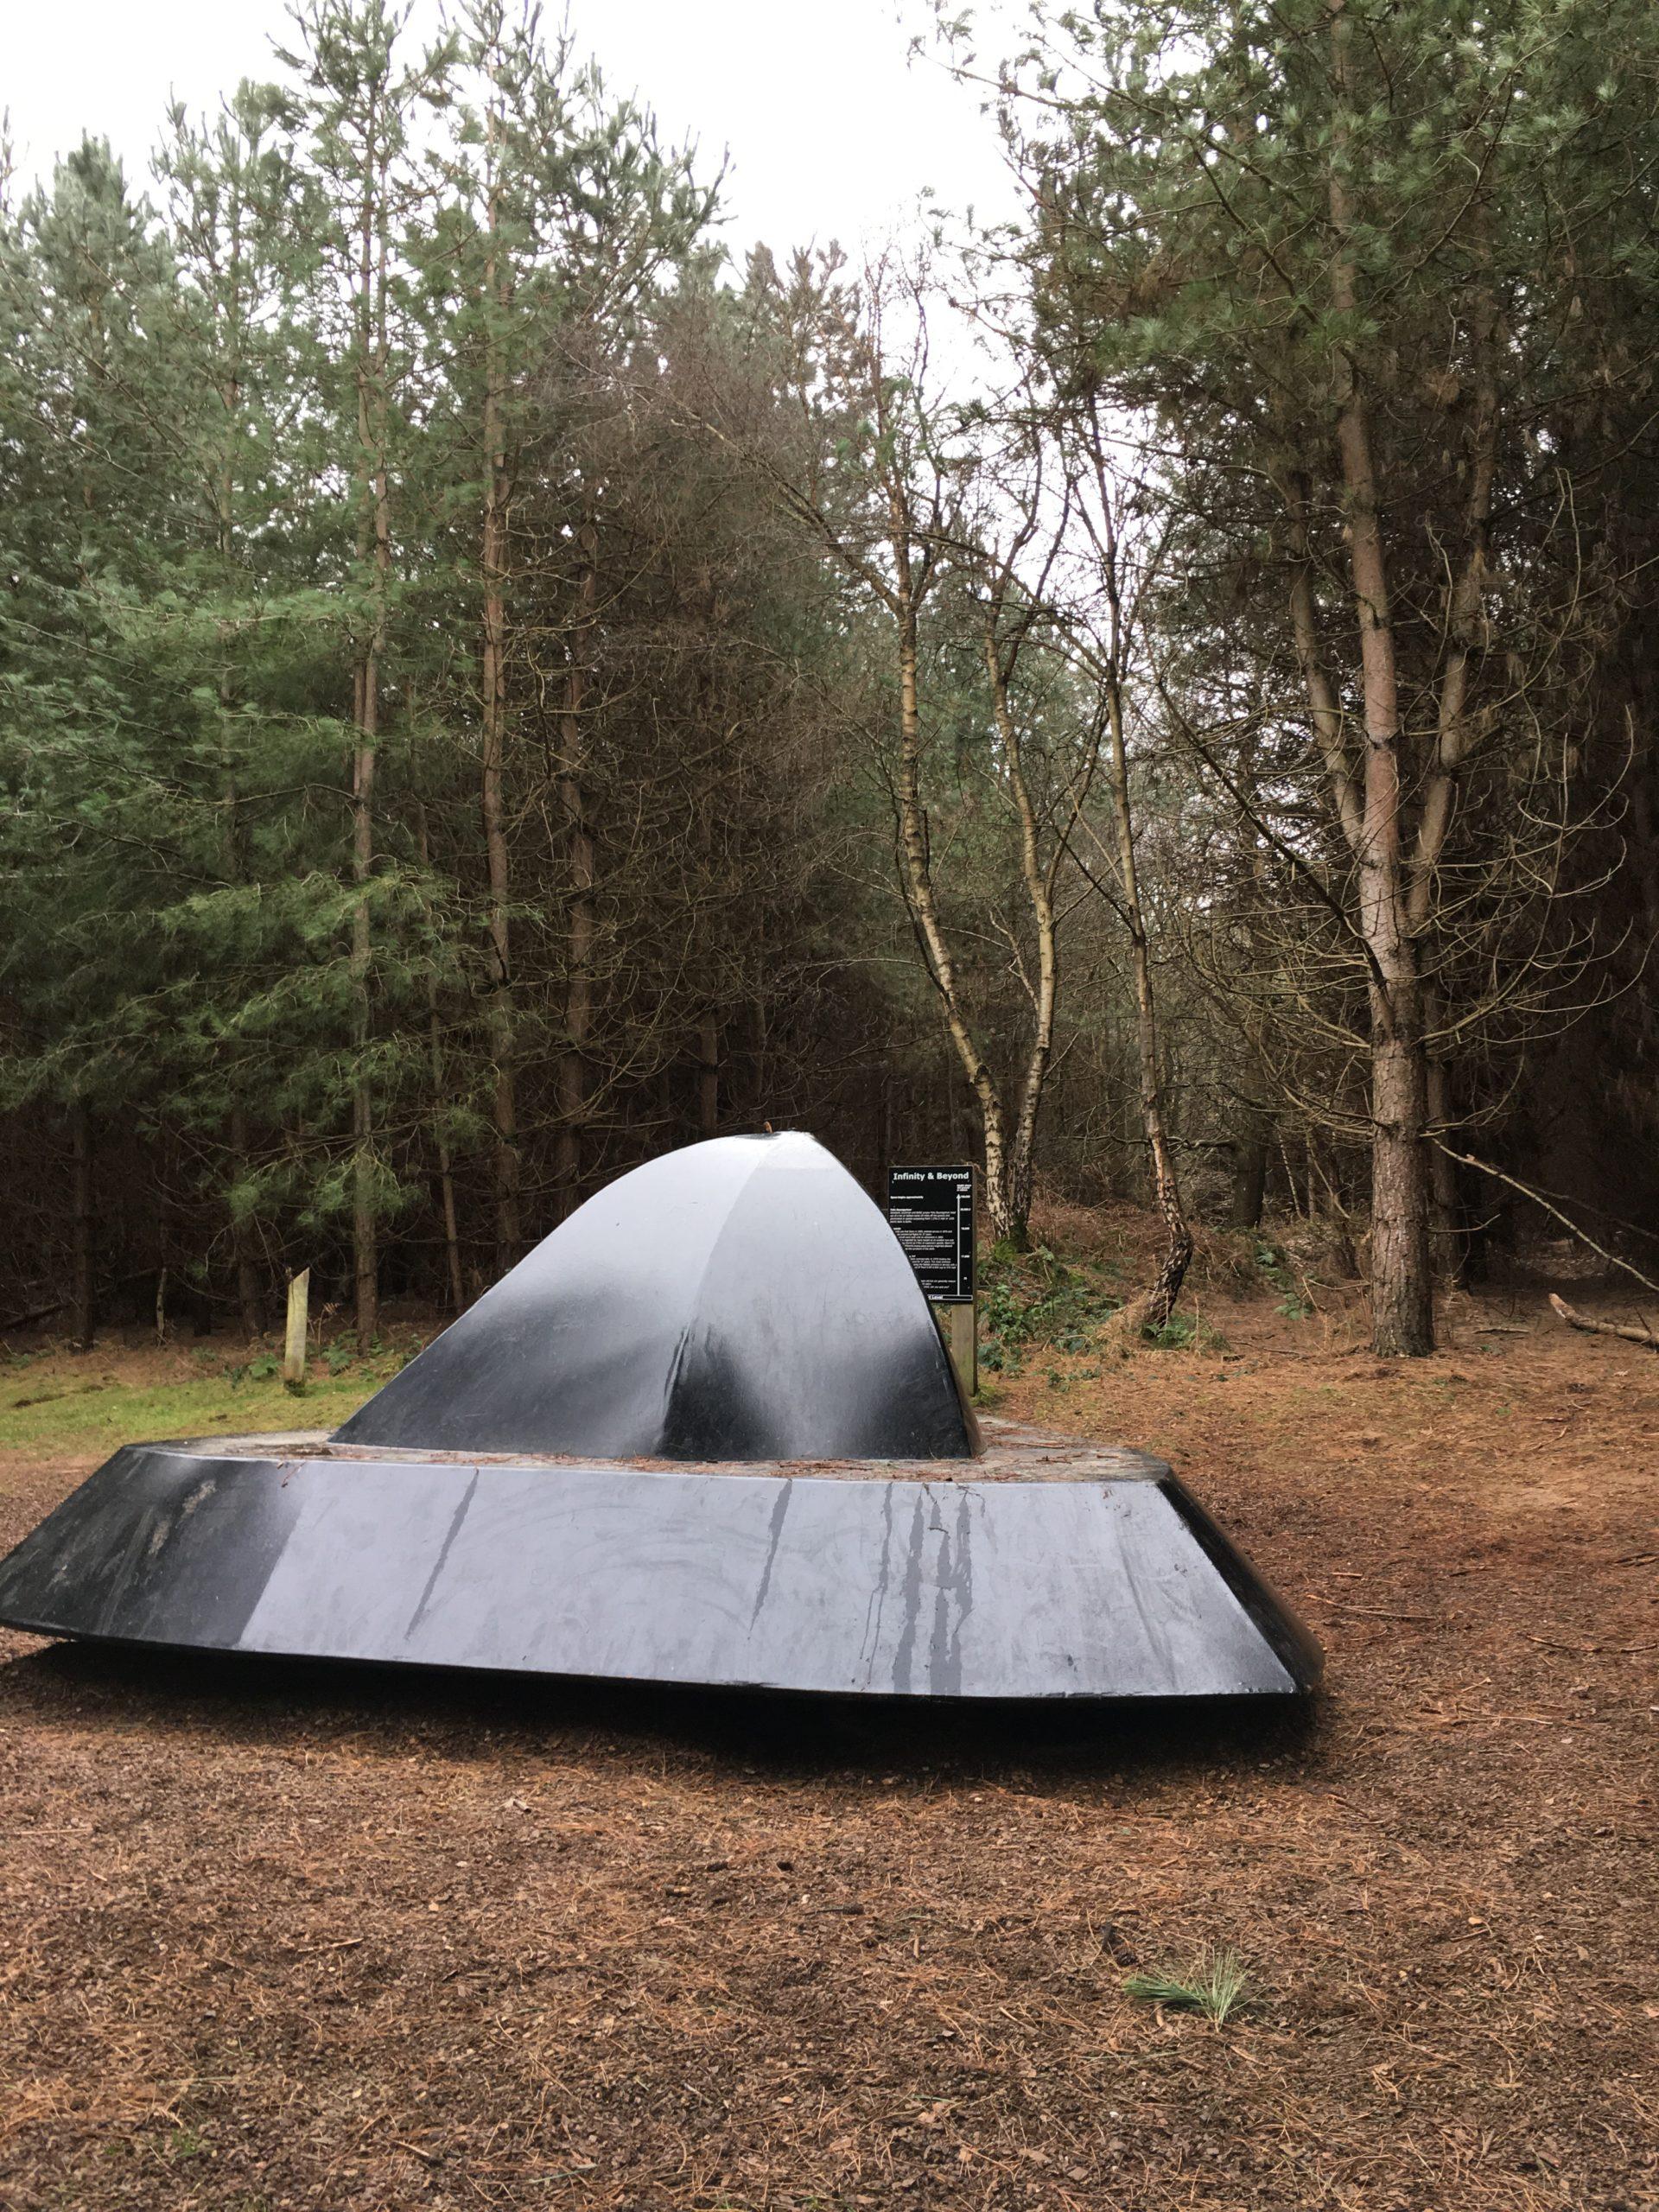 UFO Trail in Rendlesham